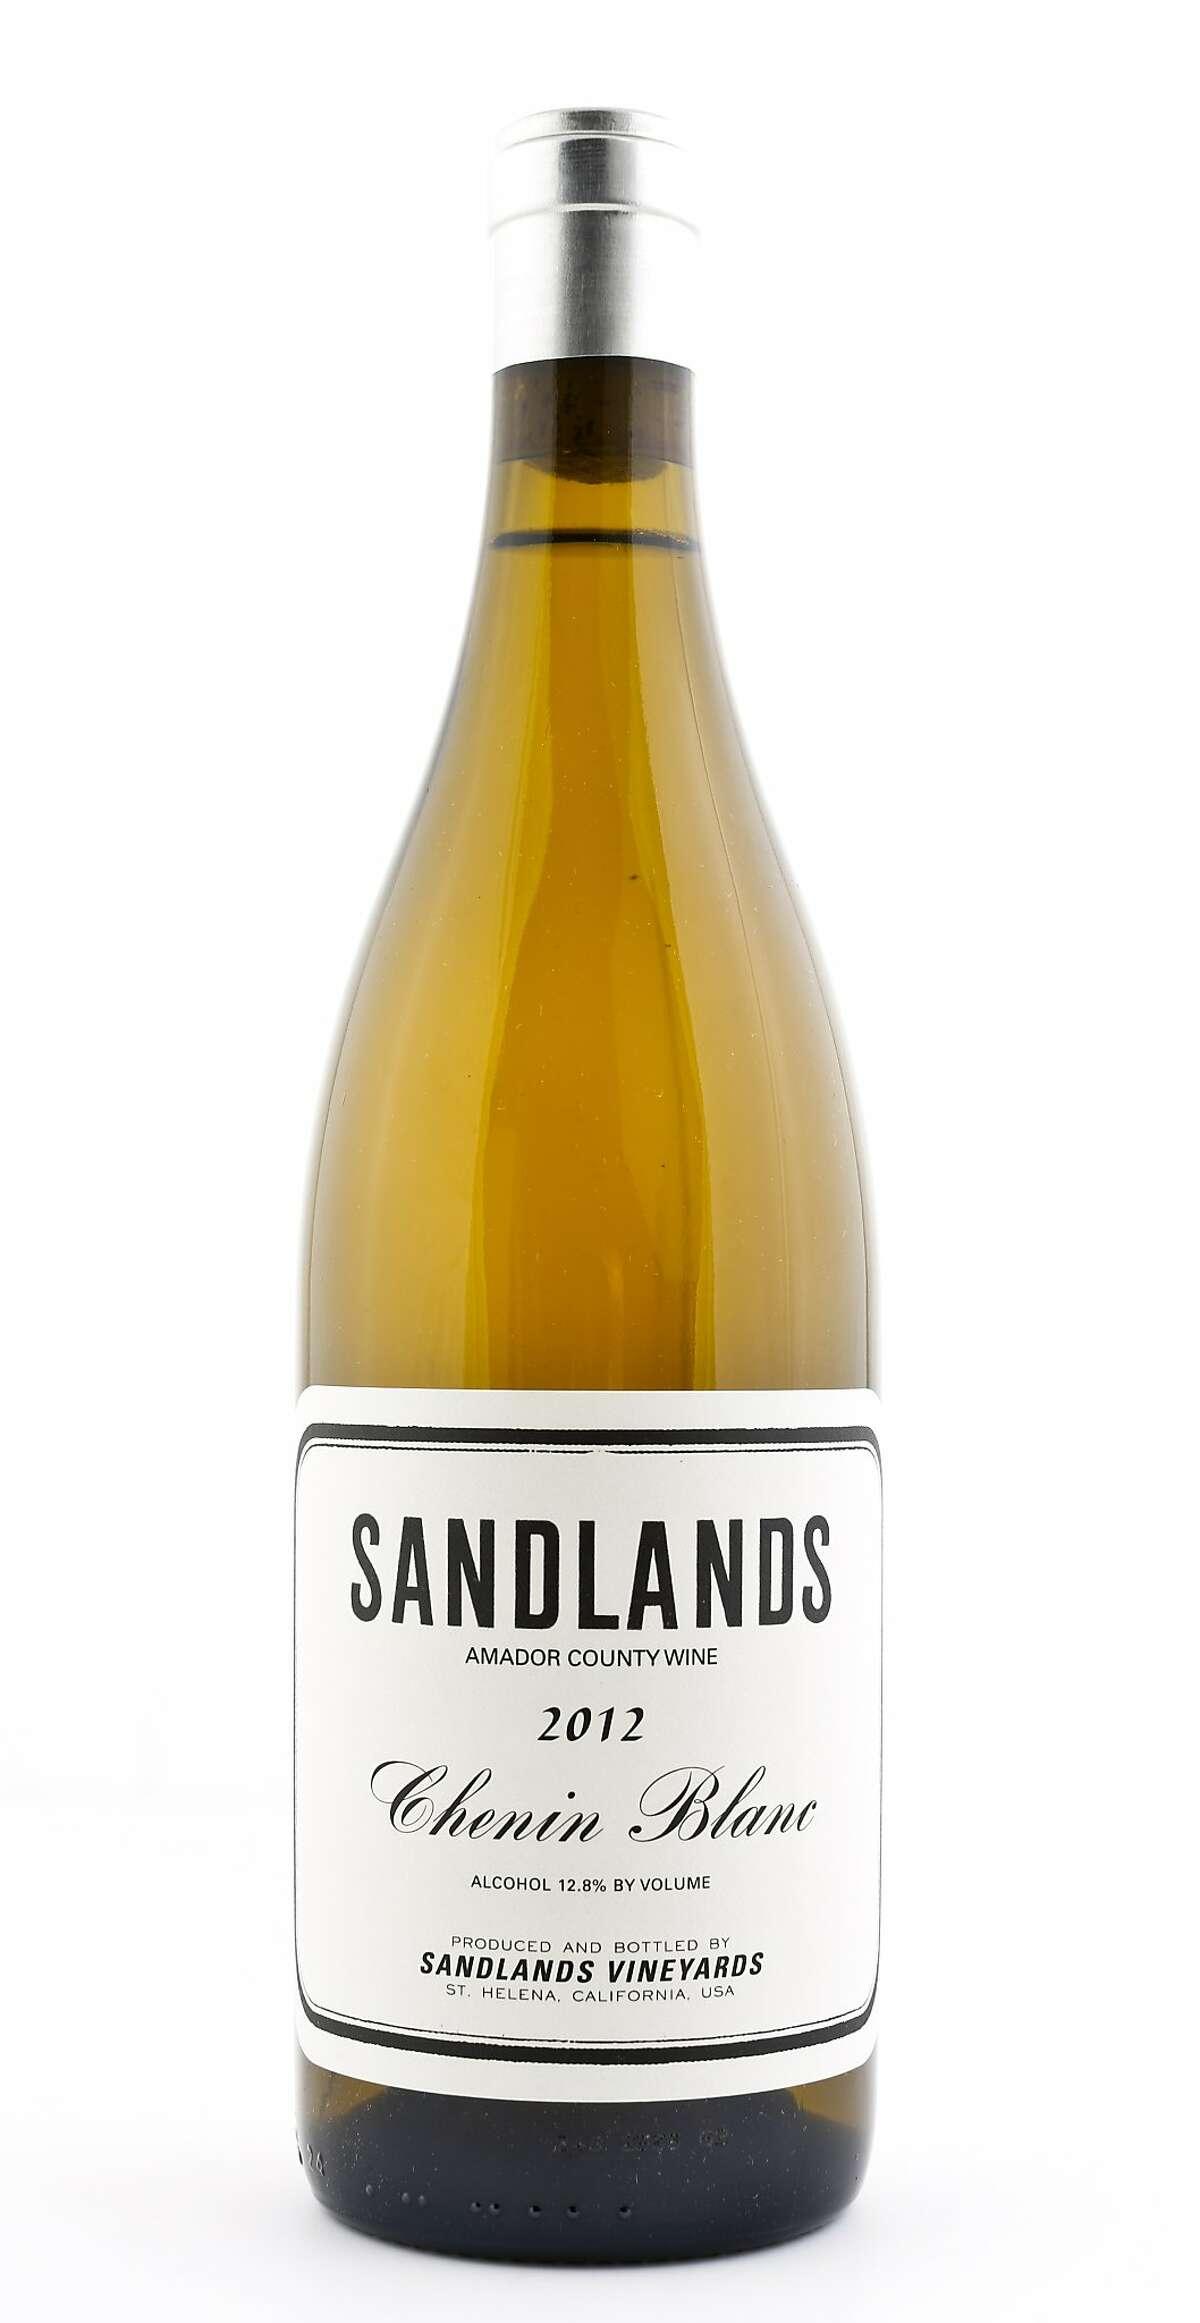 Sandlands 2012 Chenin Blanc is seen on Thursday, Dec. 4, 2014 in San Francisco, Calif.